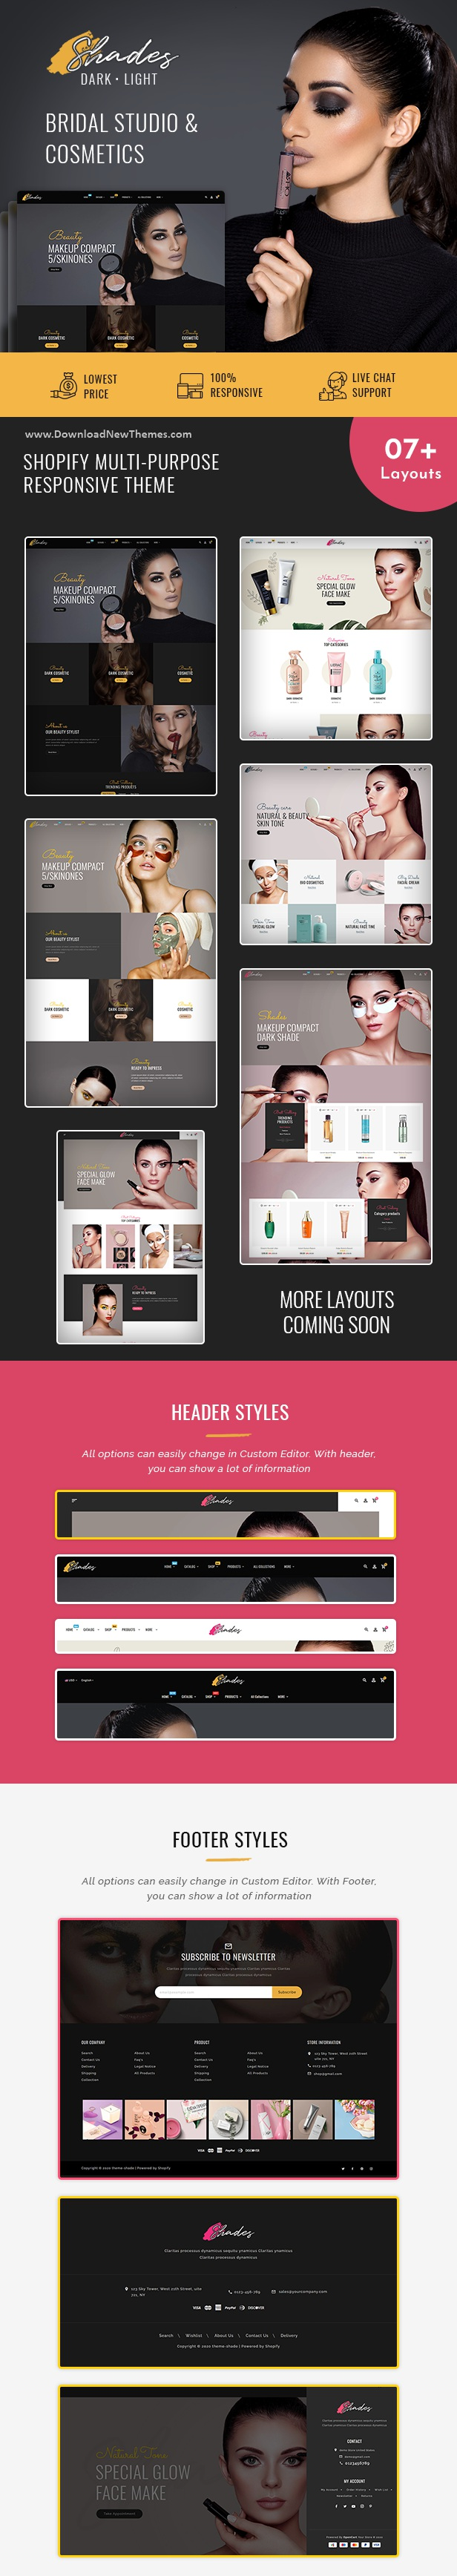 Free Shades Bridal Studio Shopify Responsive Theme